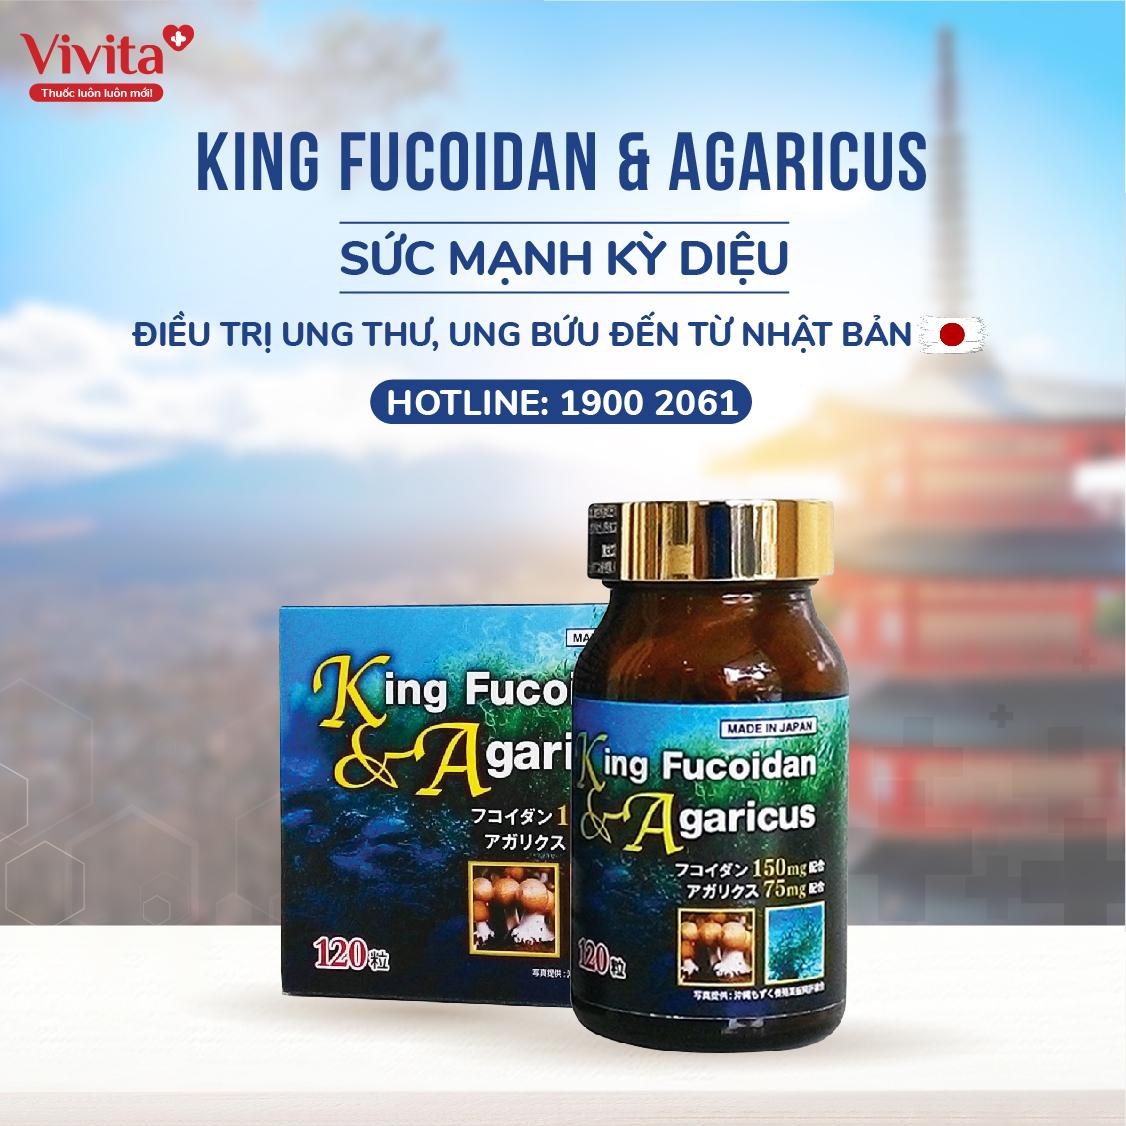 king fucodian